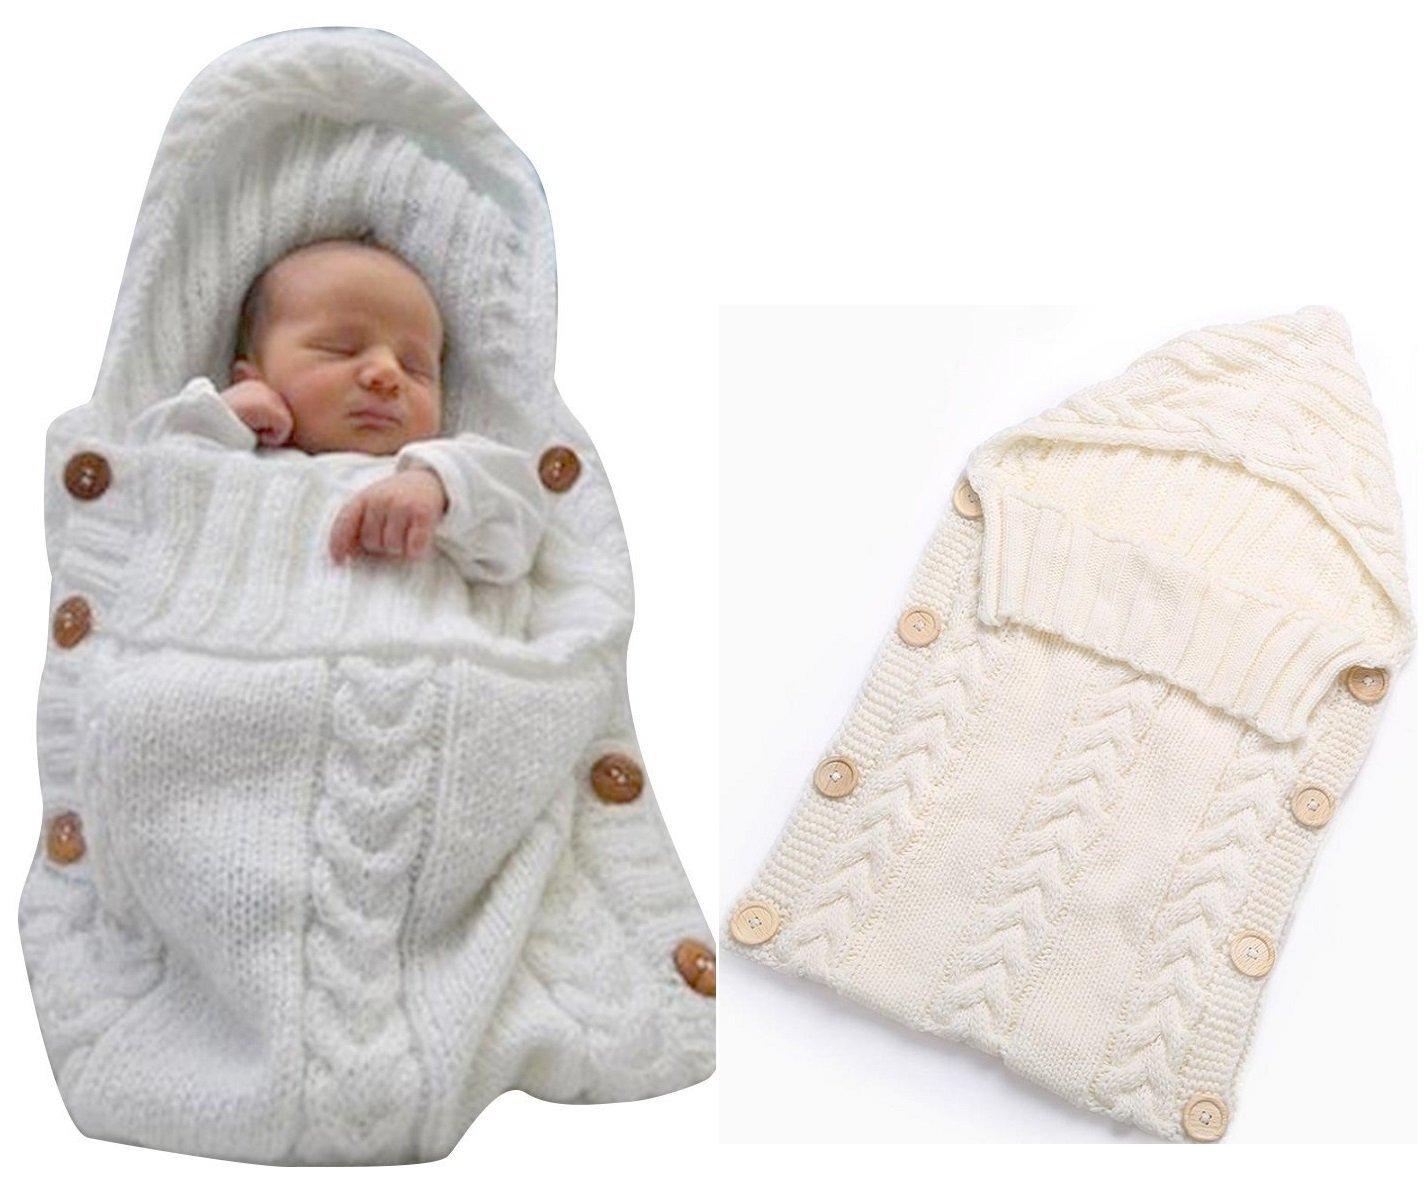 f44d89e6 Sovepose-baby-strikket-hvit-1 - handel123.no